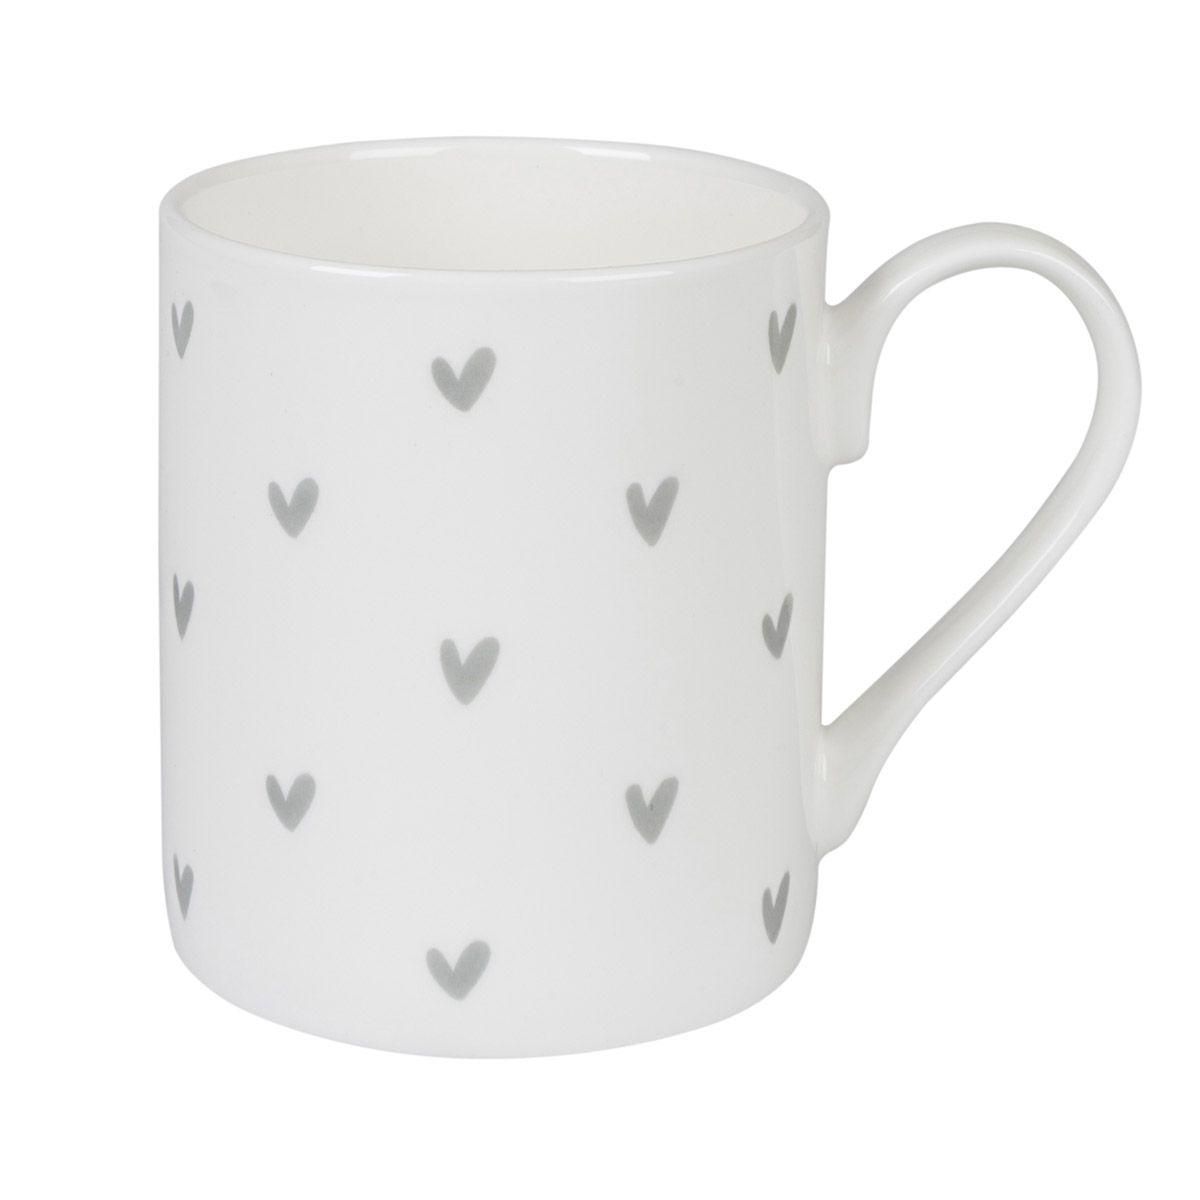 Chic Hearts Mugs Set of 4 Fine Bone China Hearts Mugs Hand Decorated in the UK